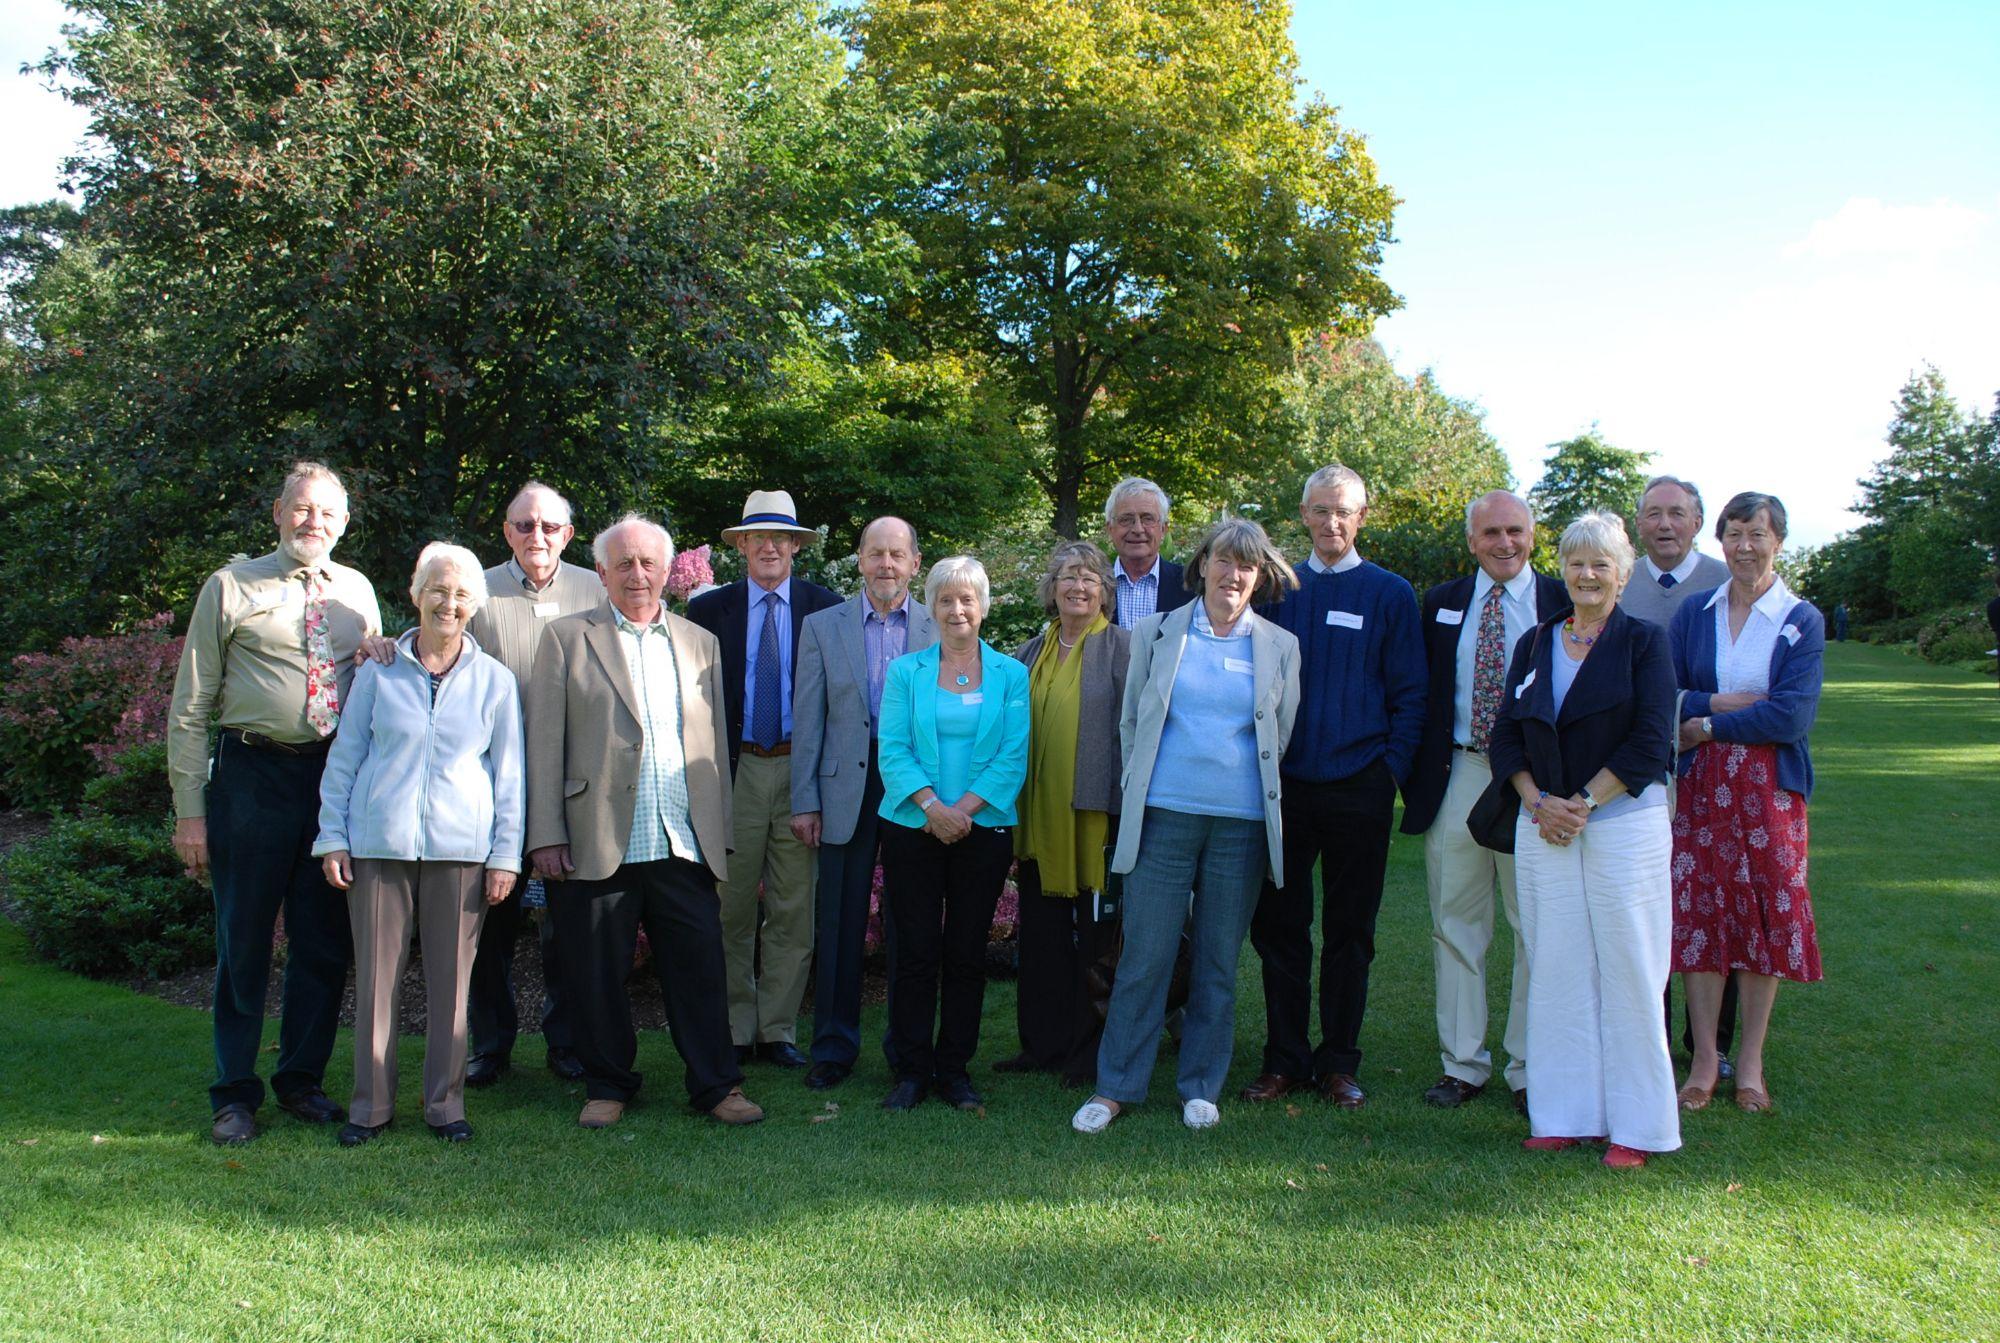 RHS students 1960 reunited at GC Day